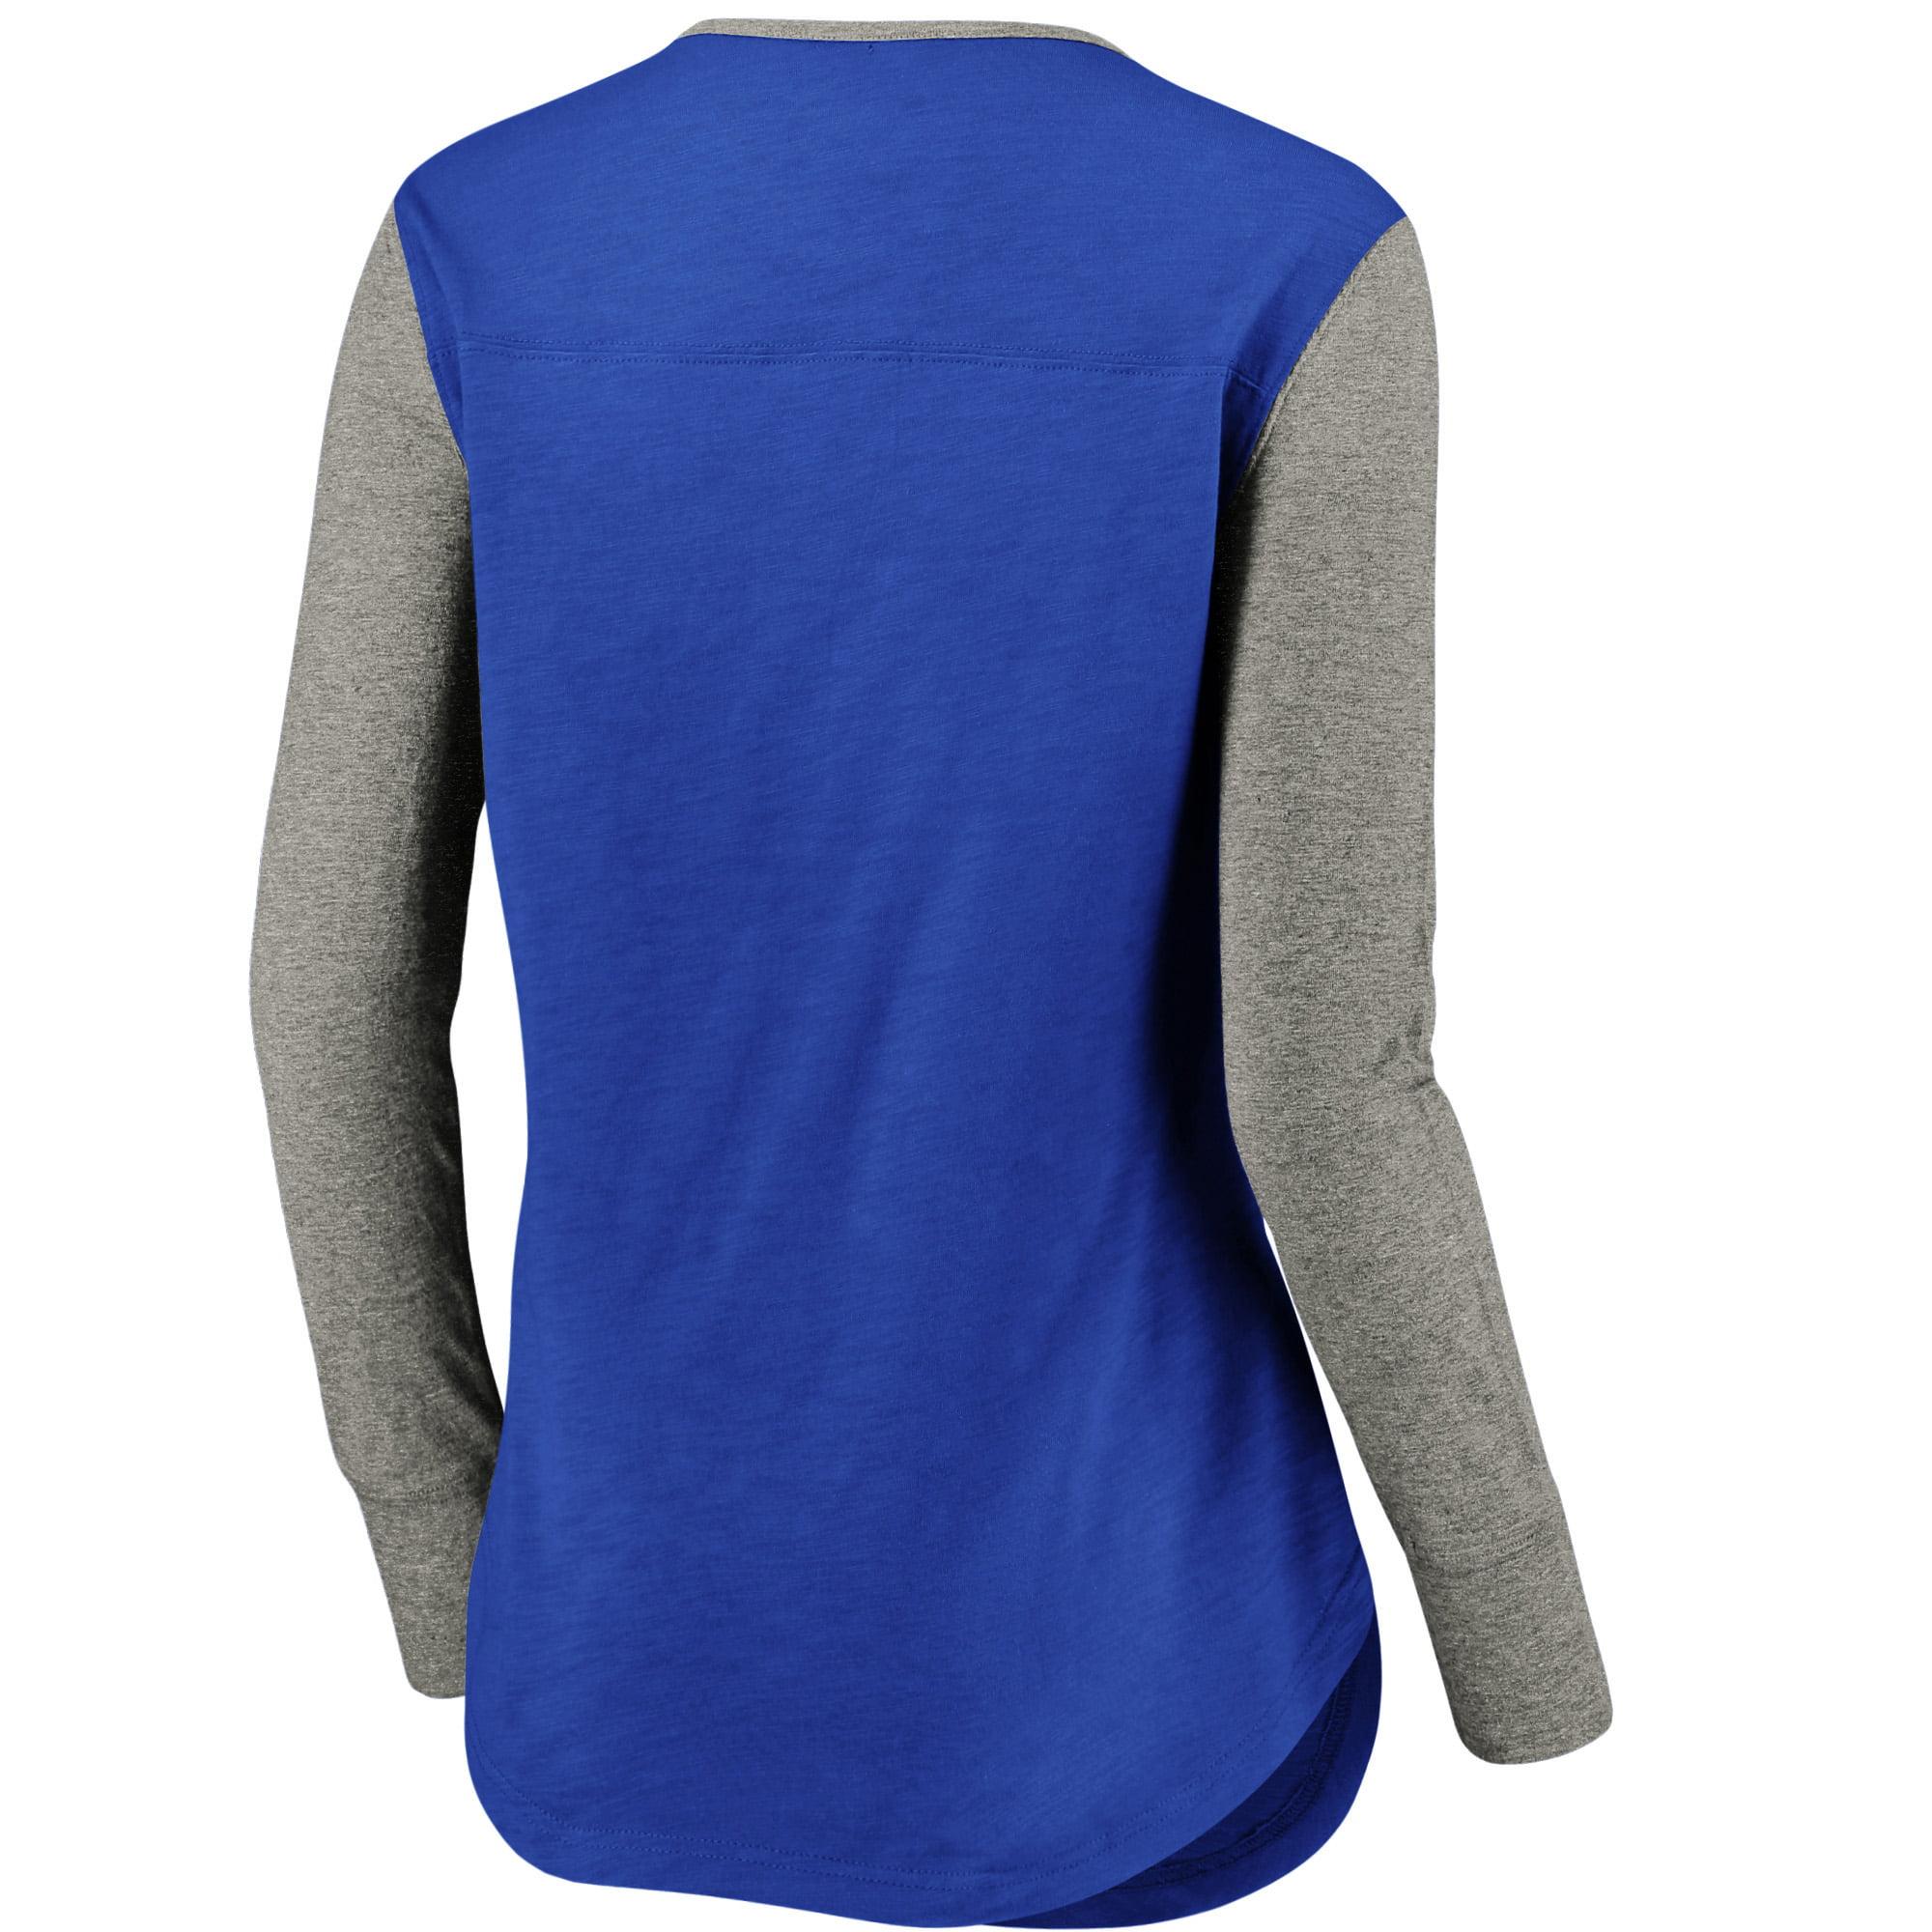 c51847dc4 Chicago Cubs Fanatics Branded Women s Plus Size True Classics Long Sleeve  Stripe Henley T-Shirt - Royal Gray - Walmart.com